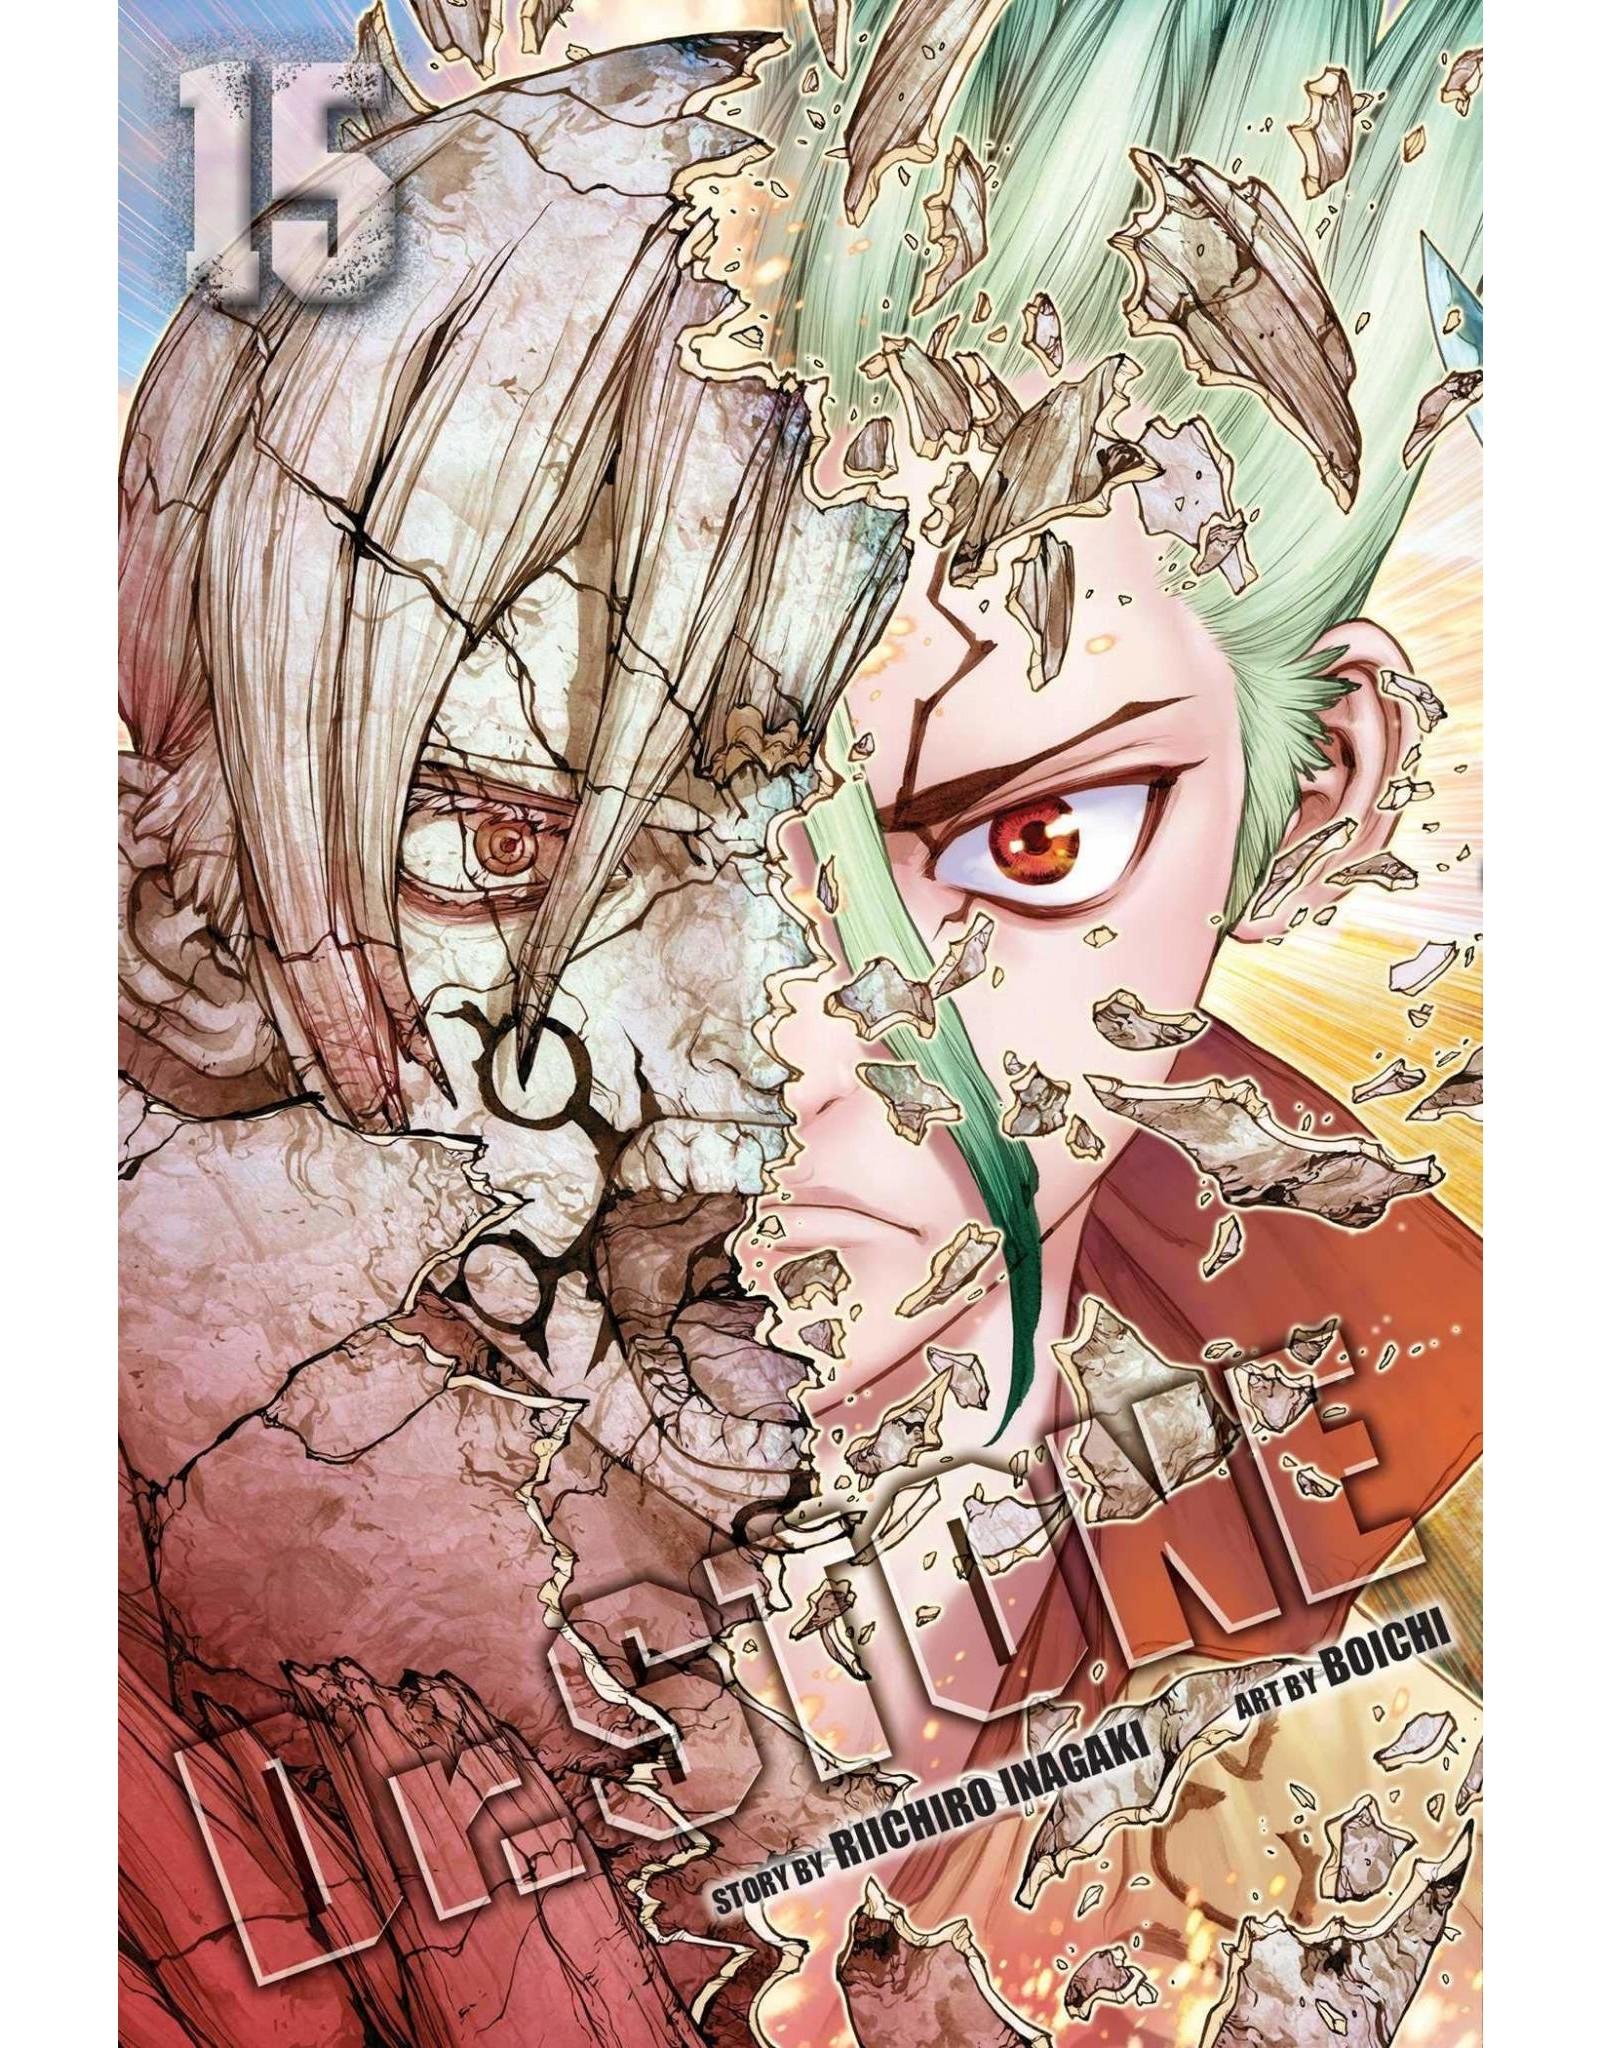 Dr. Stone 15 (English)